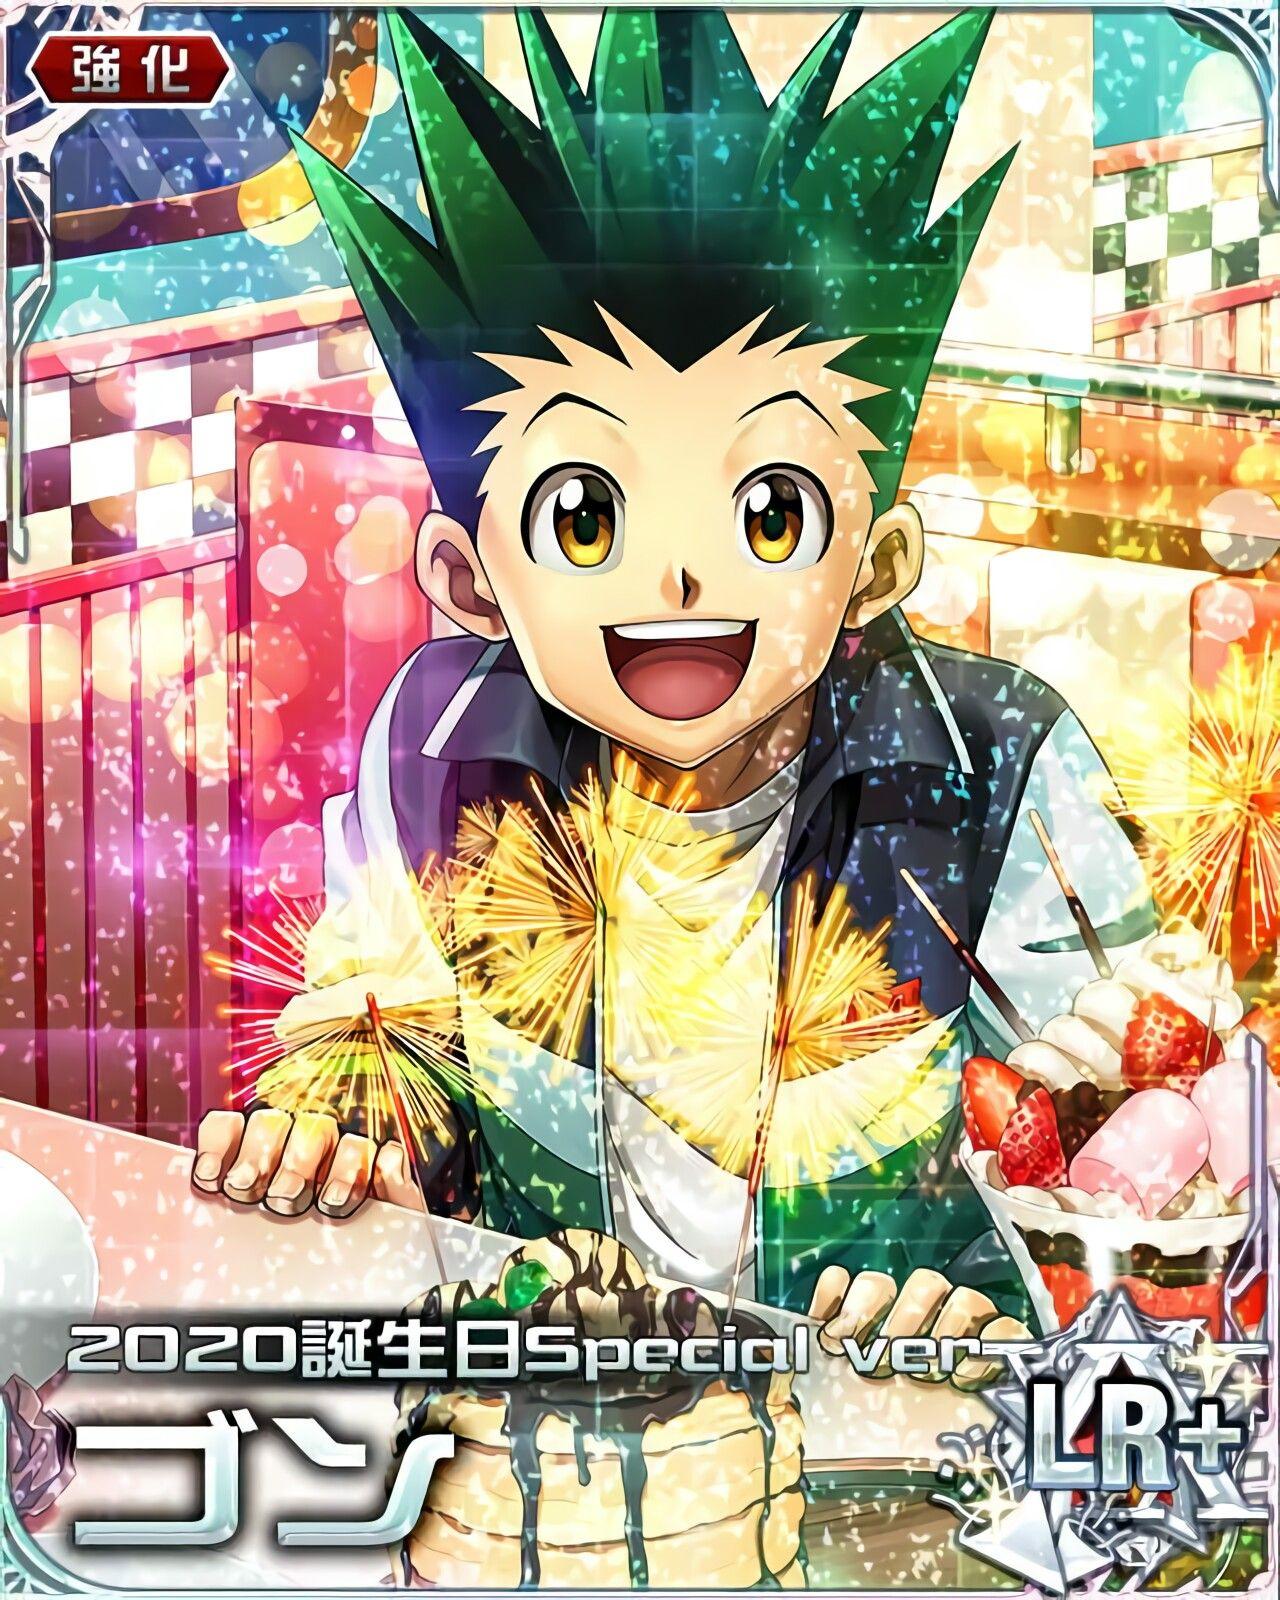 Happy Birthday Gon 2020 Hunter X Hunter Hxh Mobage Cards ゴン 2020誕生日special Ver Hunter X Hunter Hunter Anime Hunter